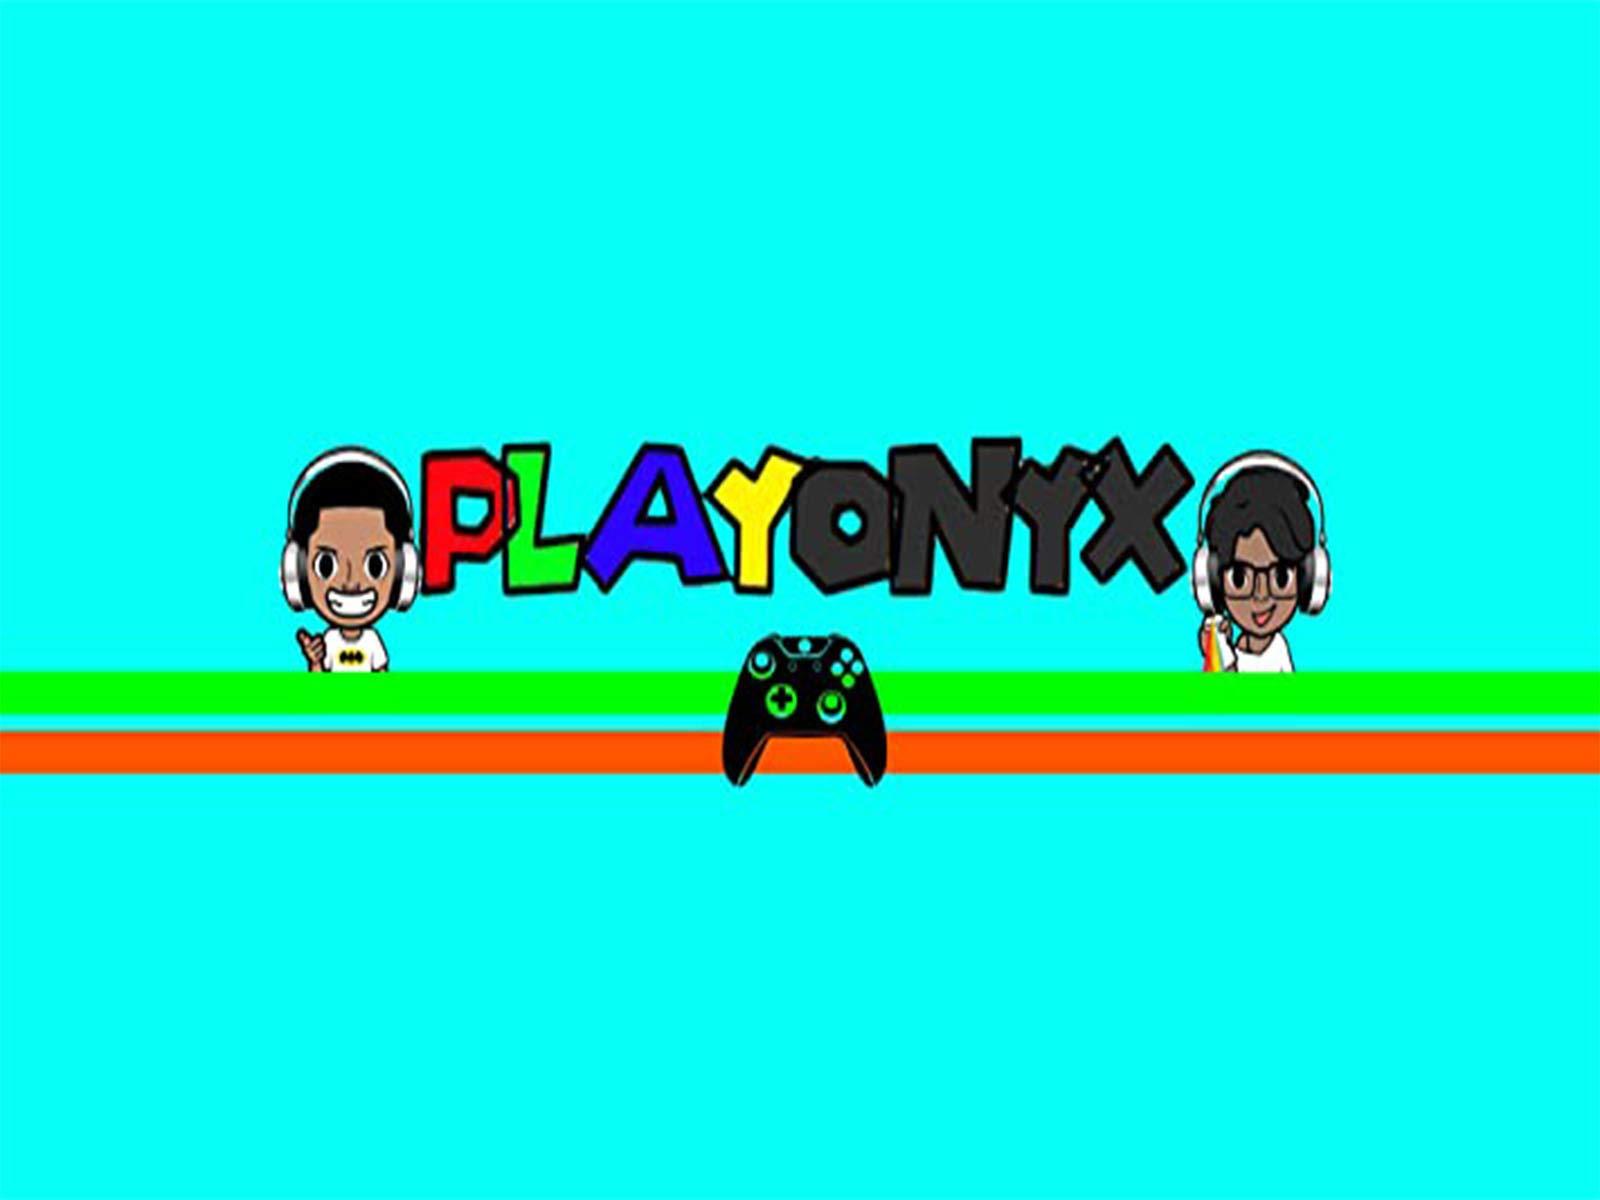 Clip: Playonyx - Season 5